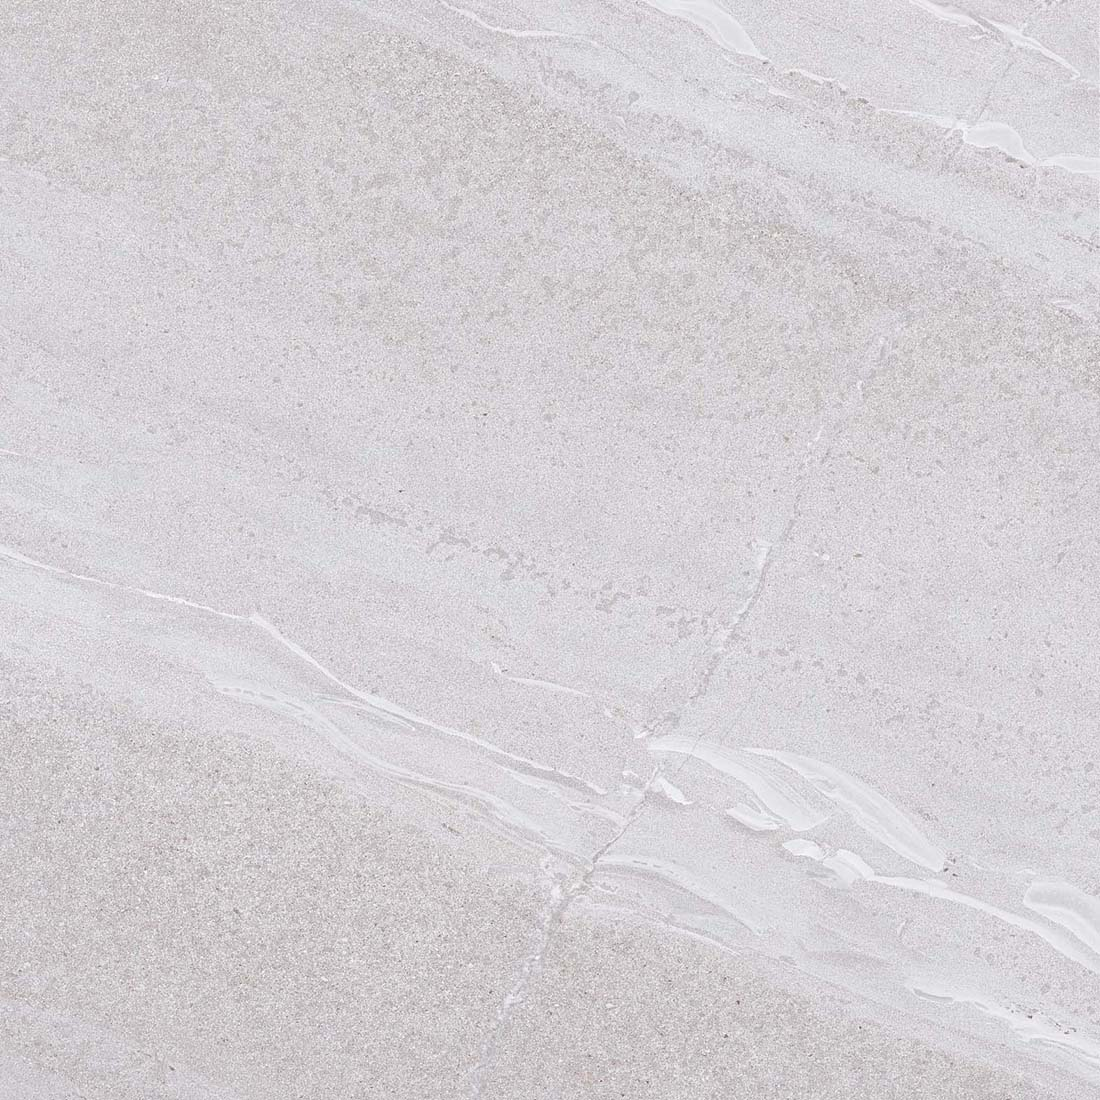 Strata 60x60 Grey Gloss 1